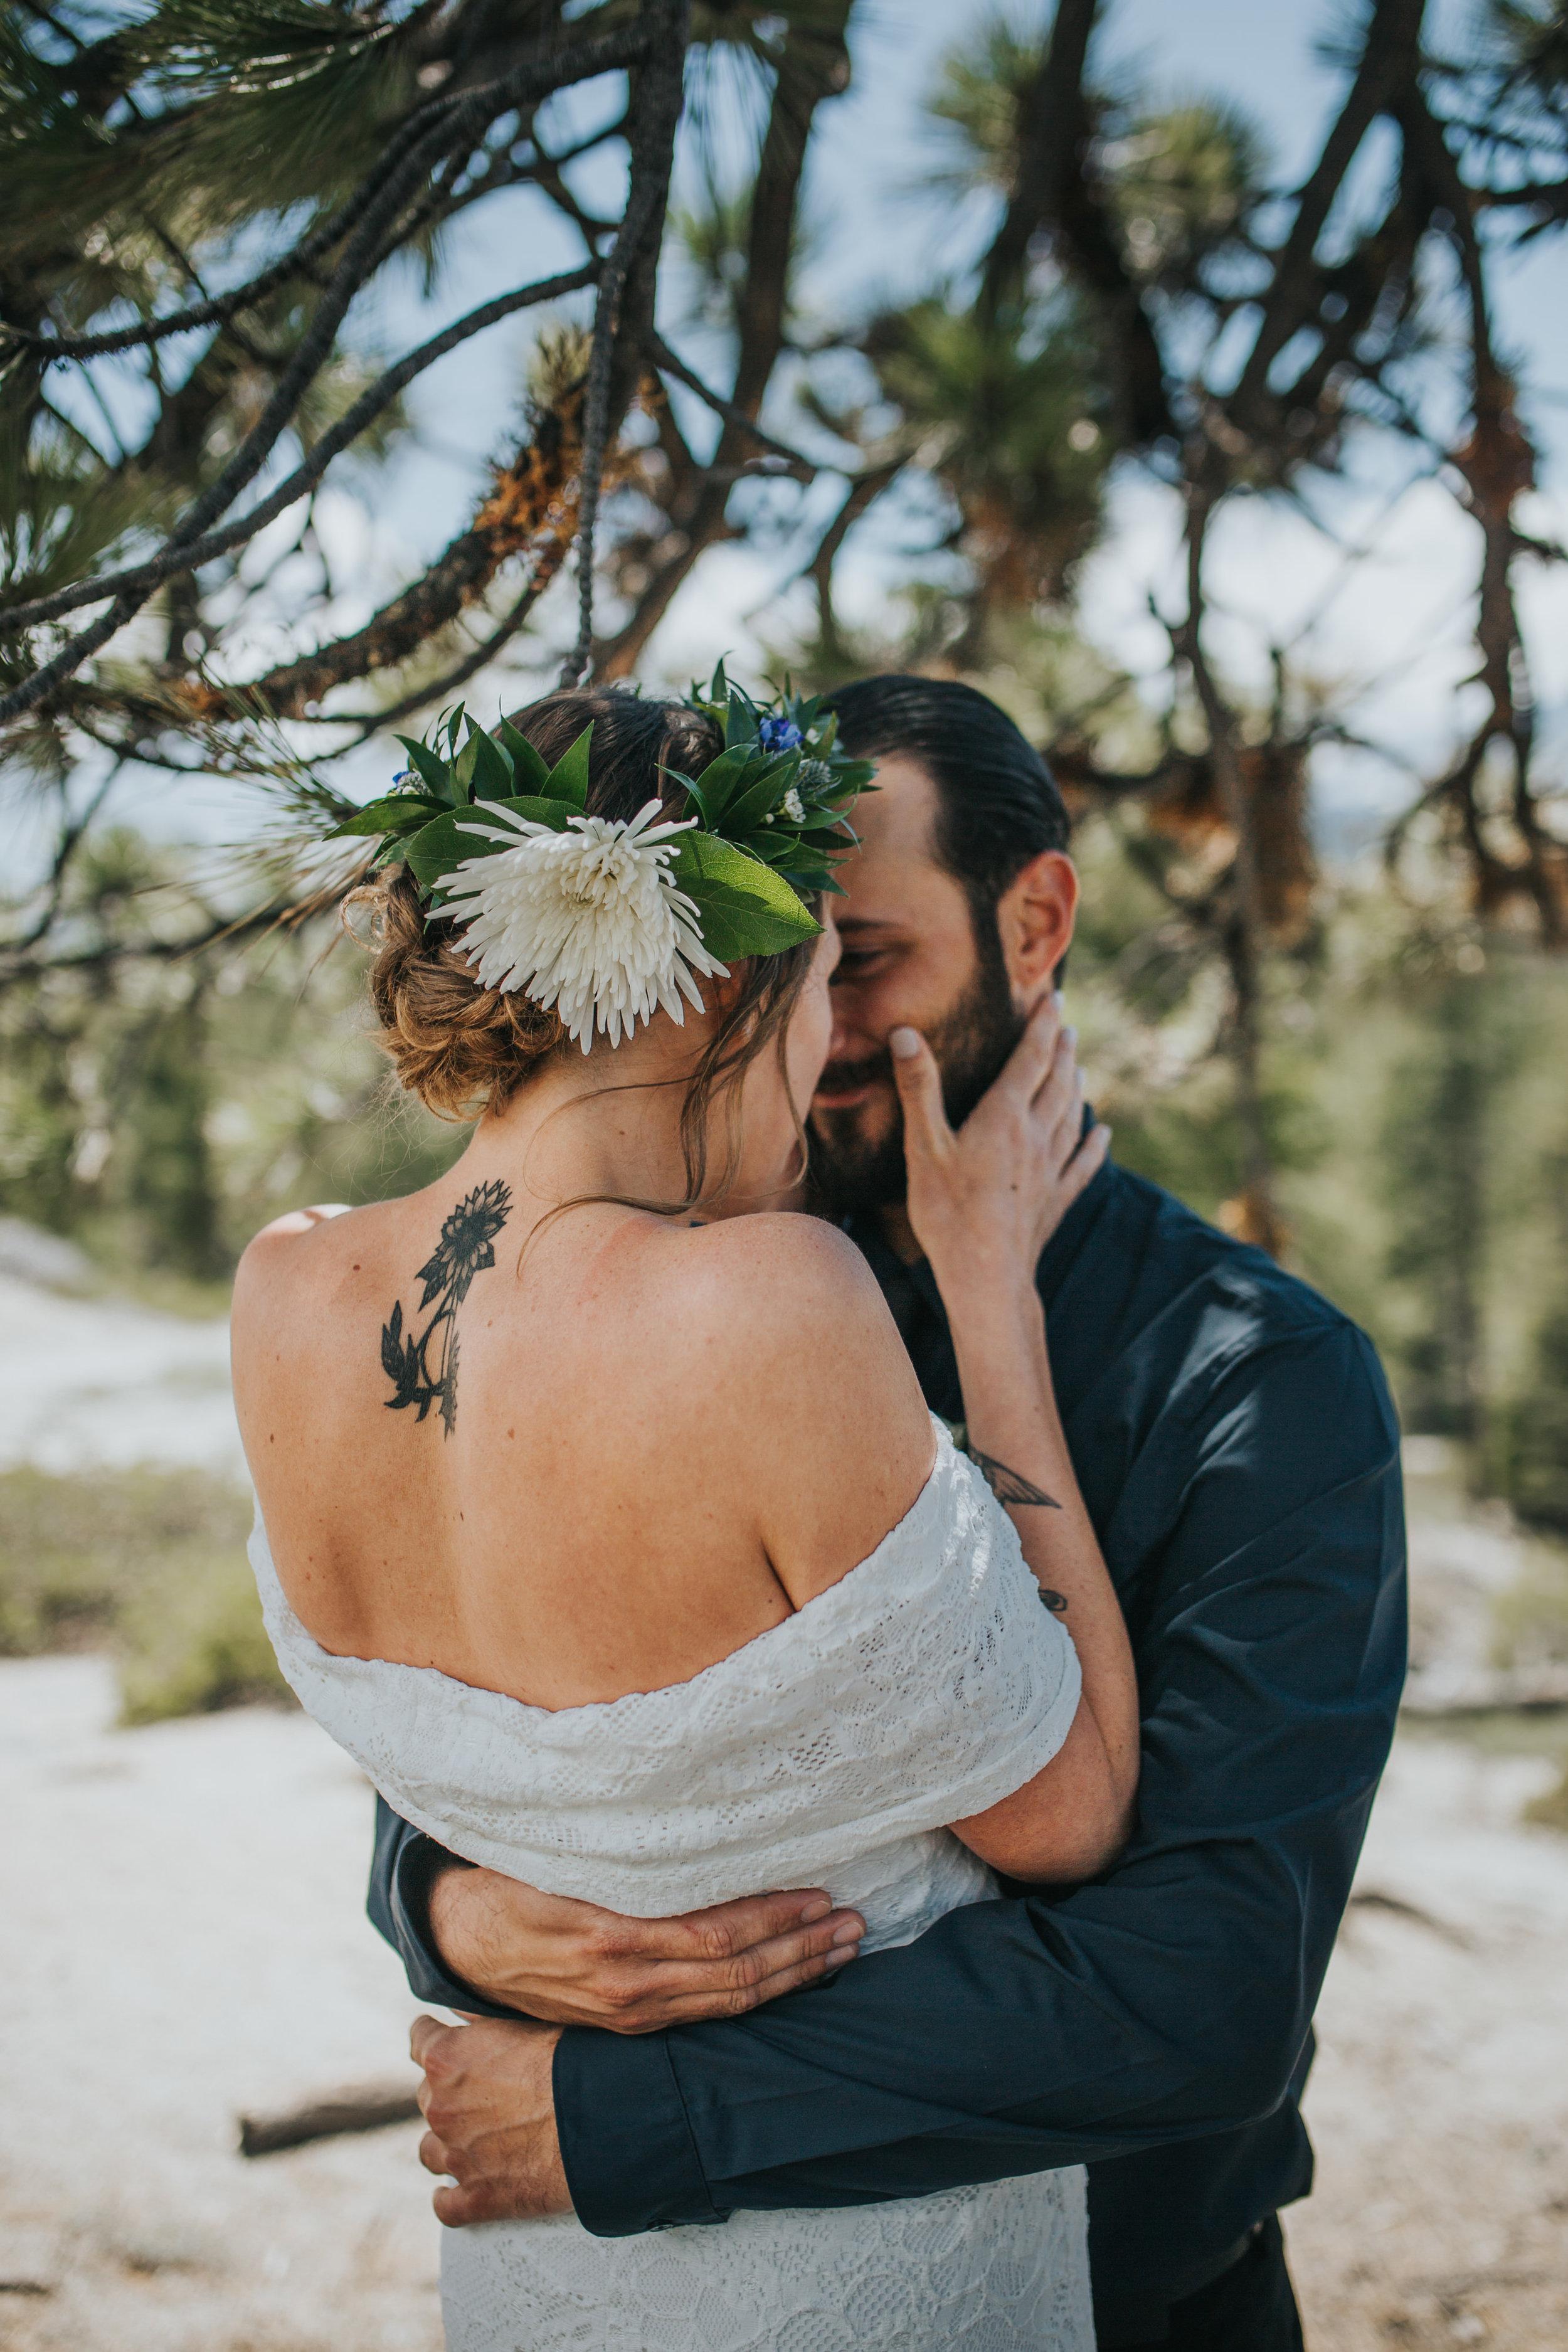 south-lake-tahoe-elopement-valerie-lendvay-photo-017.jpg